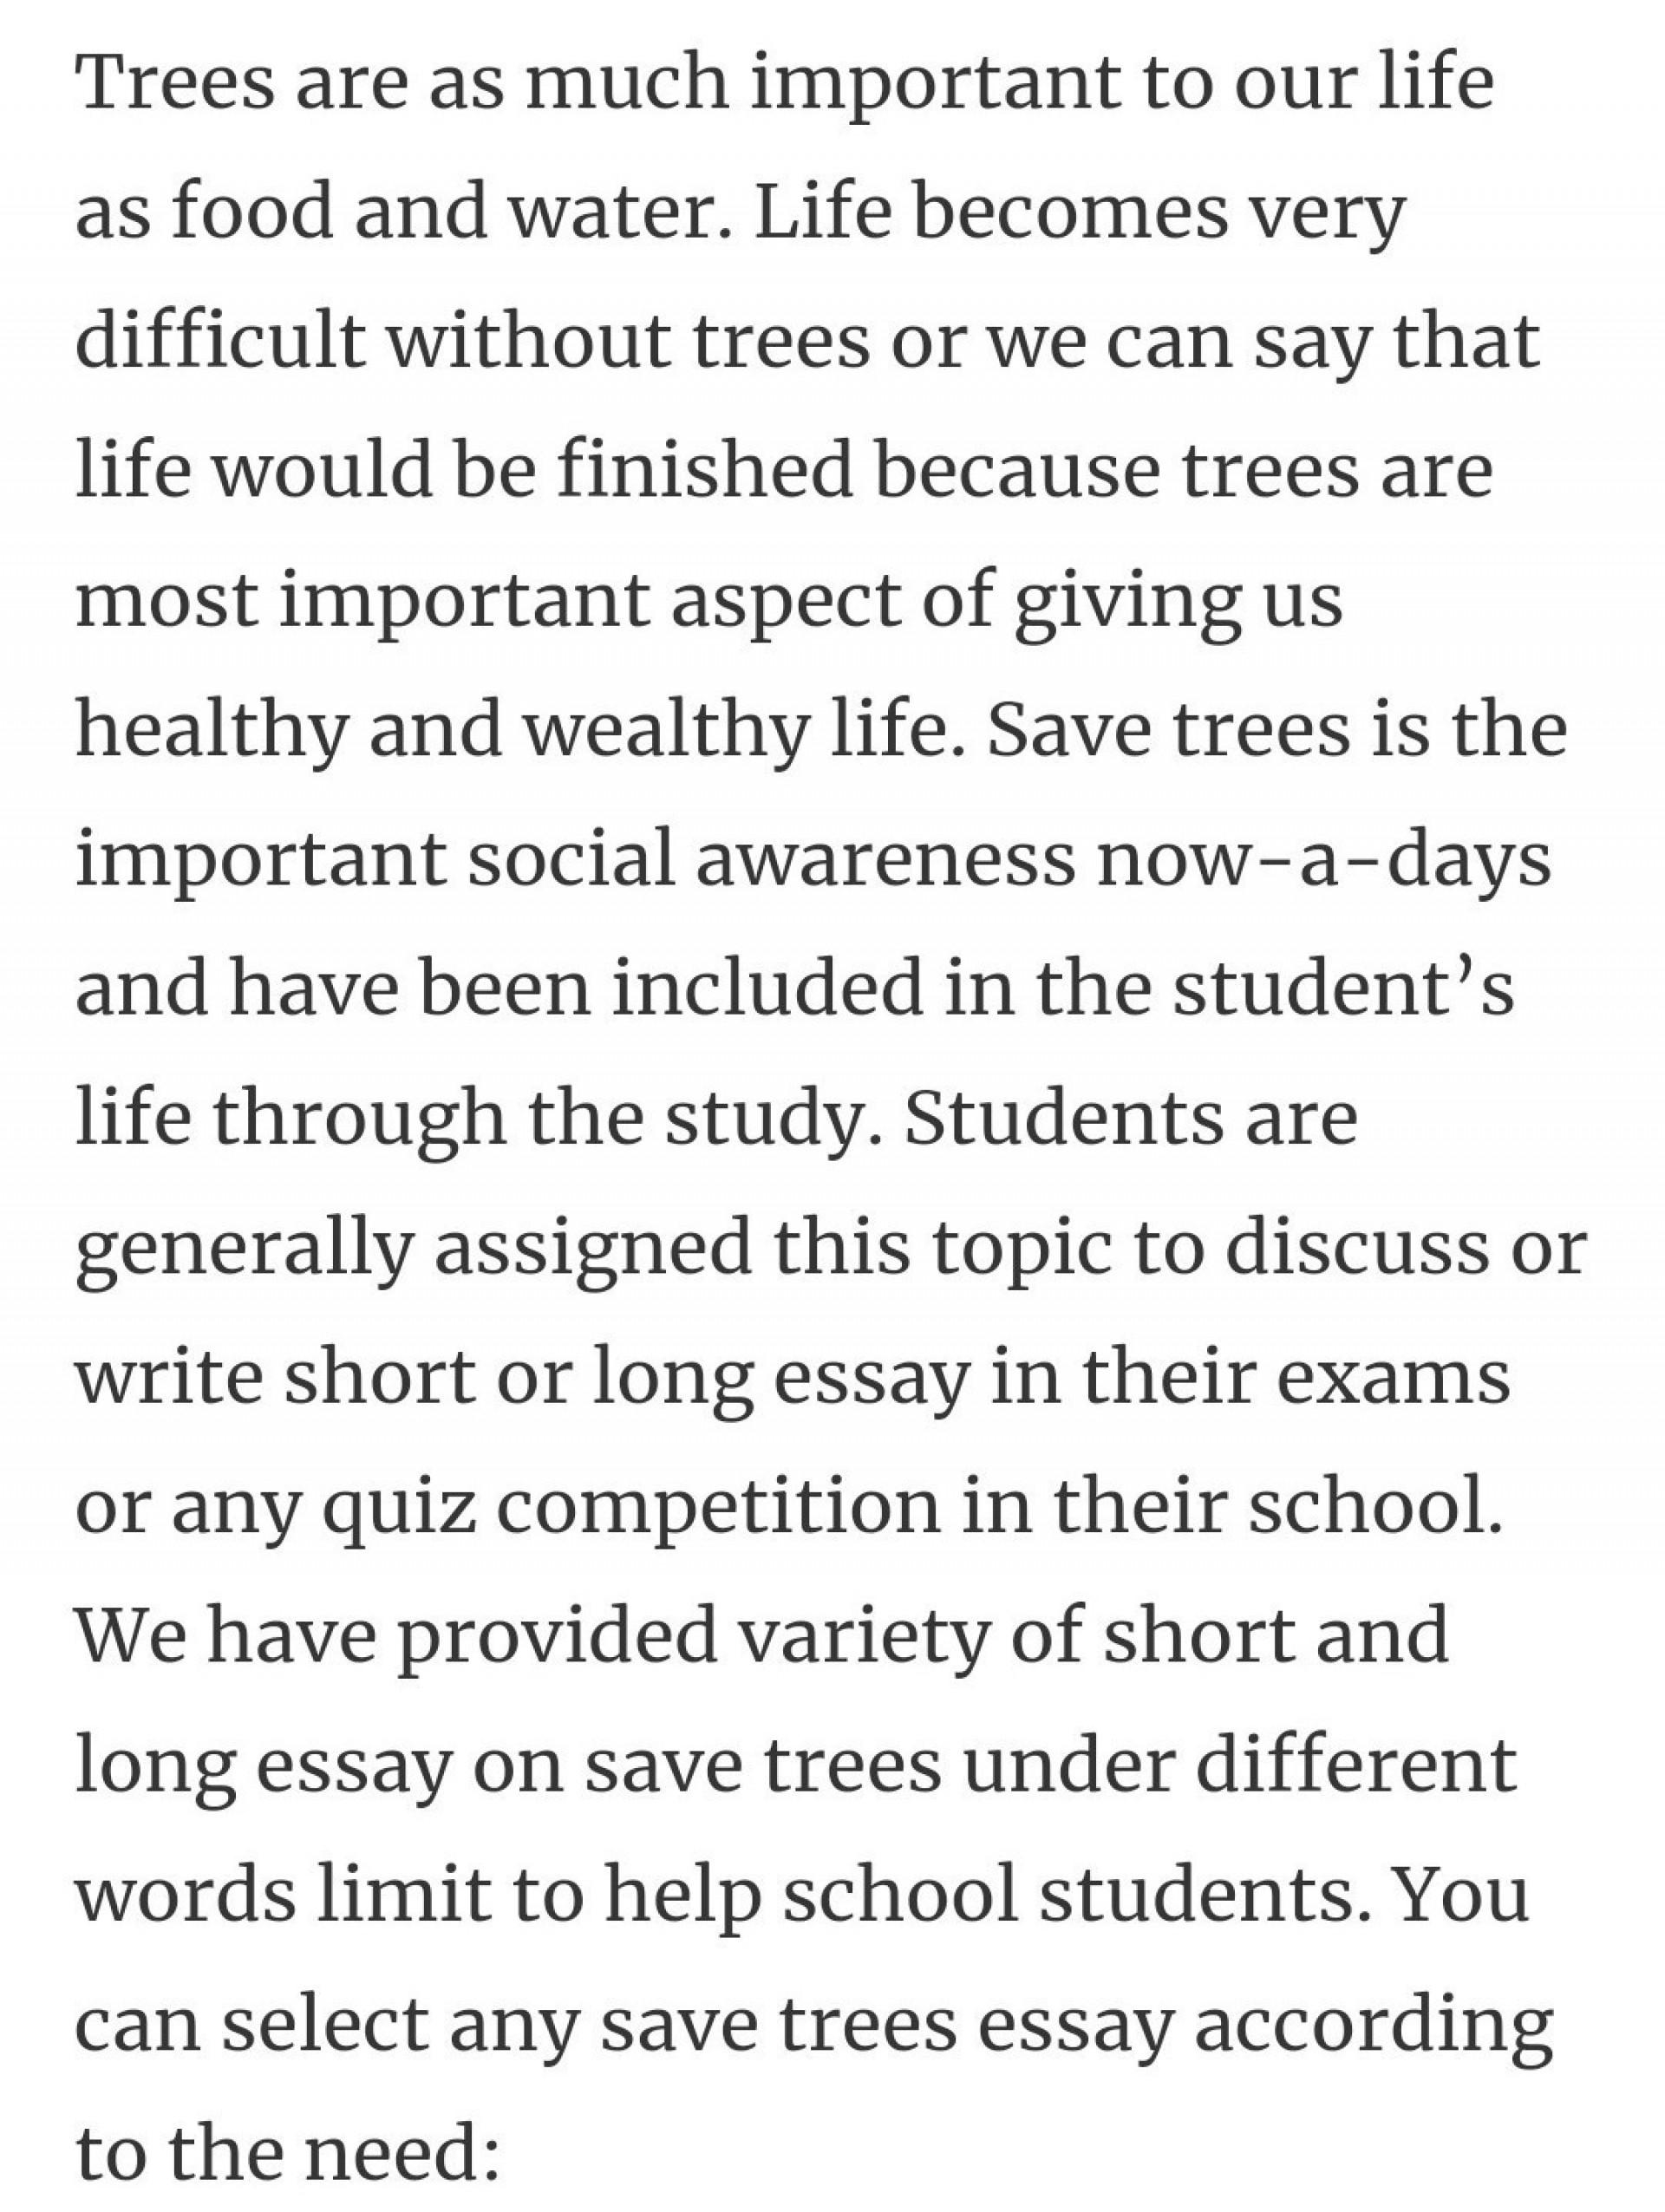 001 Essay Example Description Of Trees For Striking Essays 1920